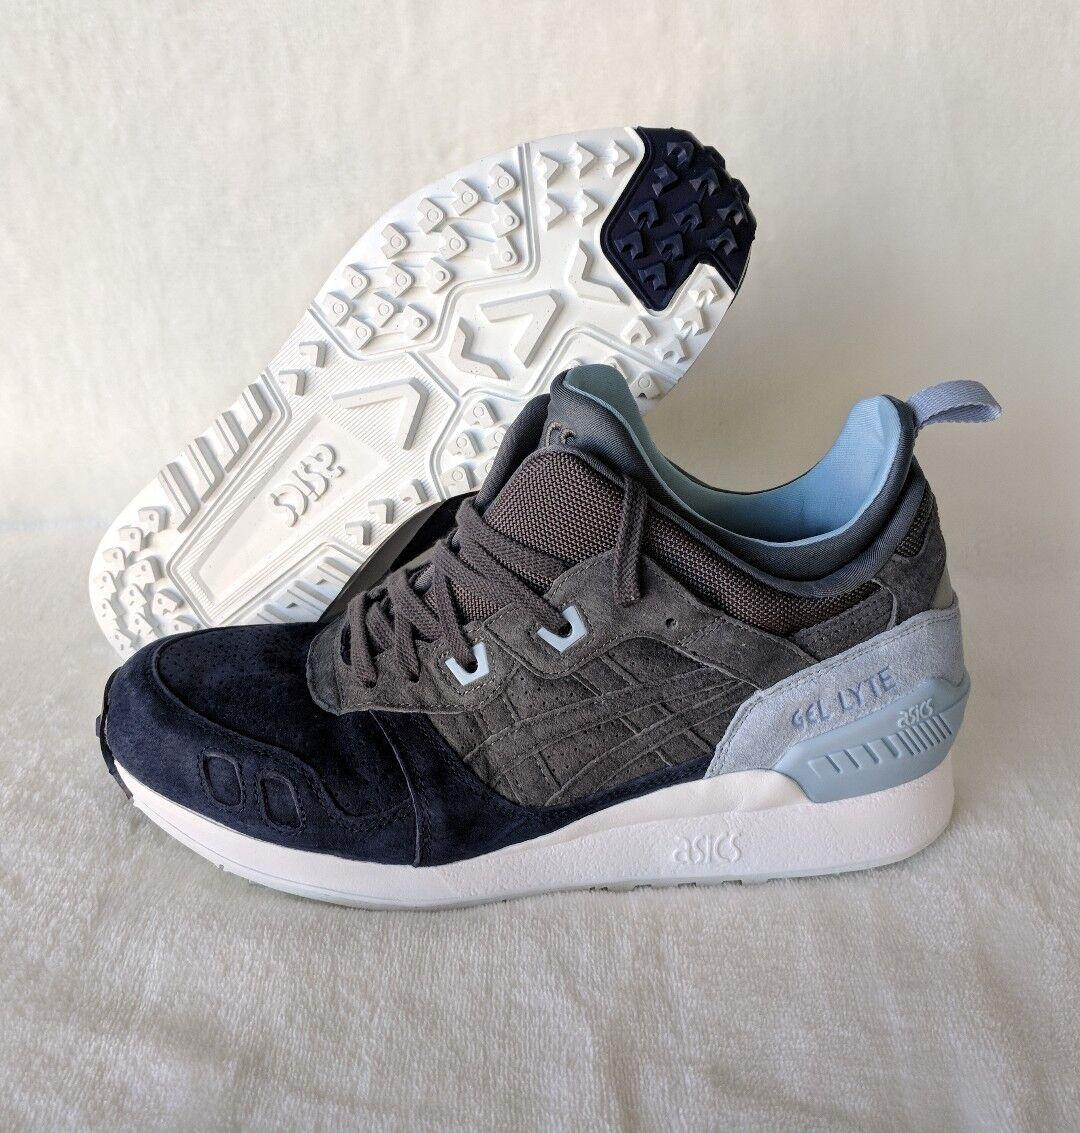 Asics Gel Lyte III MT Carbon gris Azul Trail Running Zapatos HL7Z1-9797